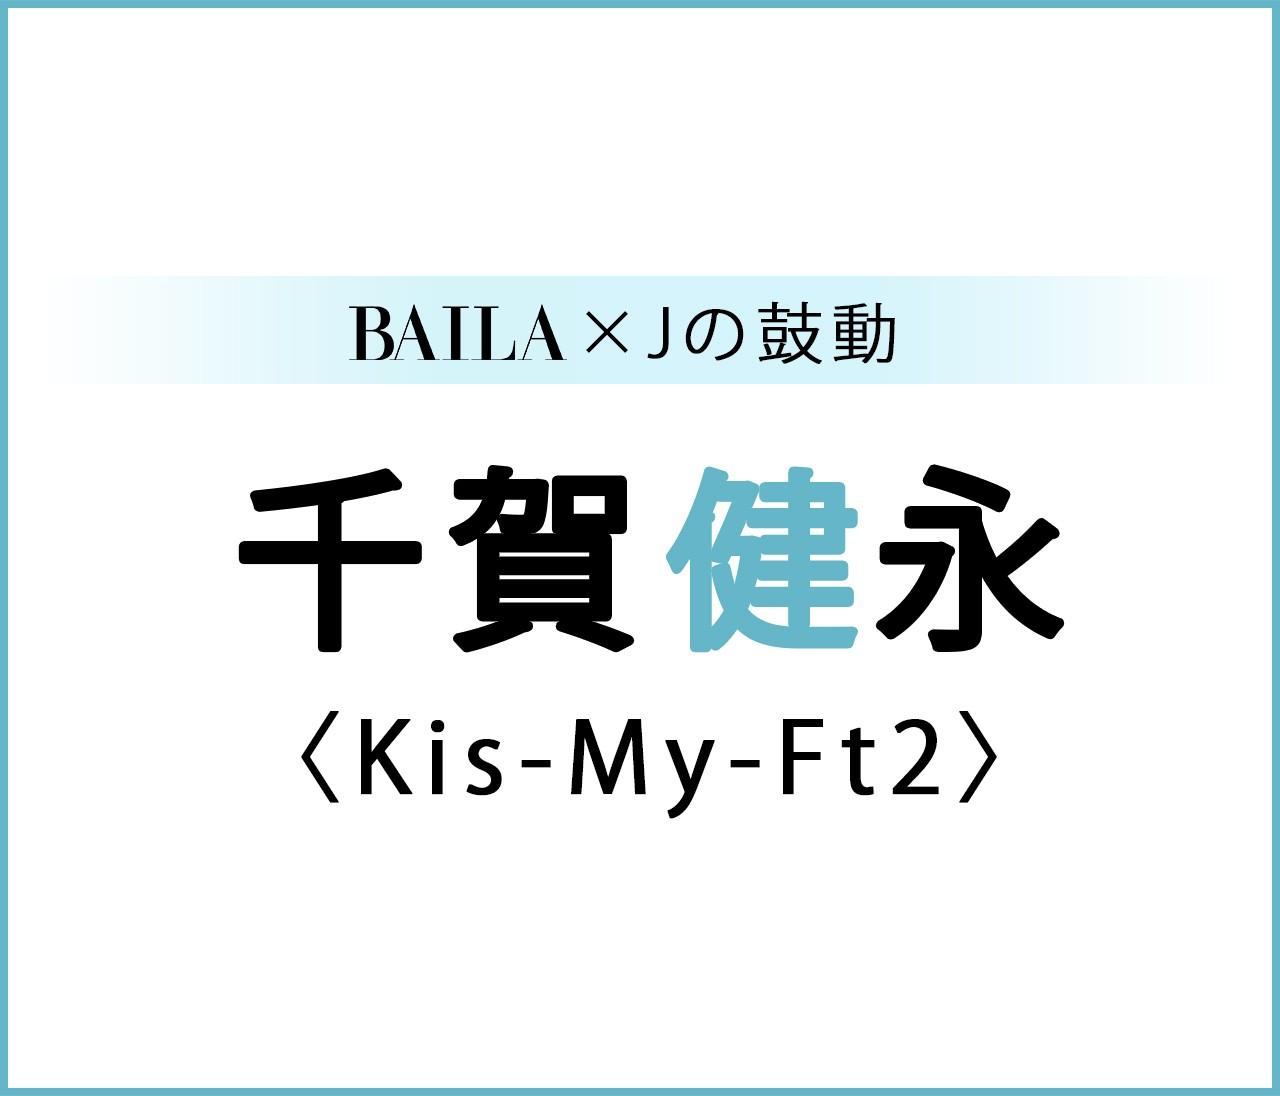 【 #KisMyFt2 #千賀健永 】Kis-My-Ft2 千賀健永スペシャルインタビュー!【BAILA × Jの鼓動】